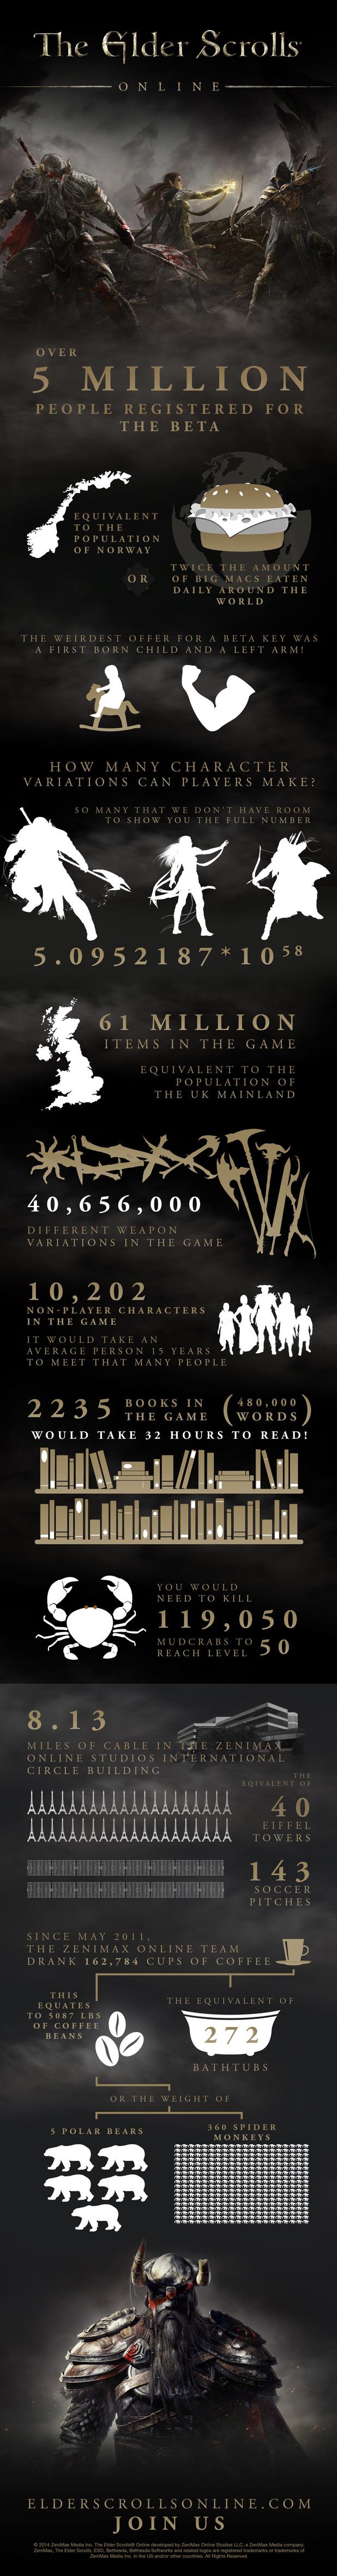 Elder Scrolls Online Infographic